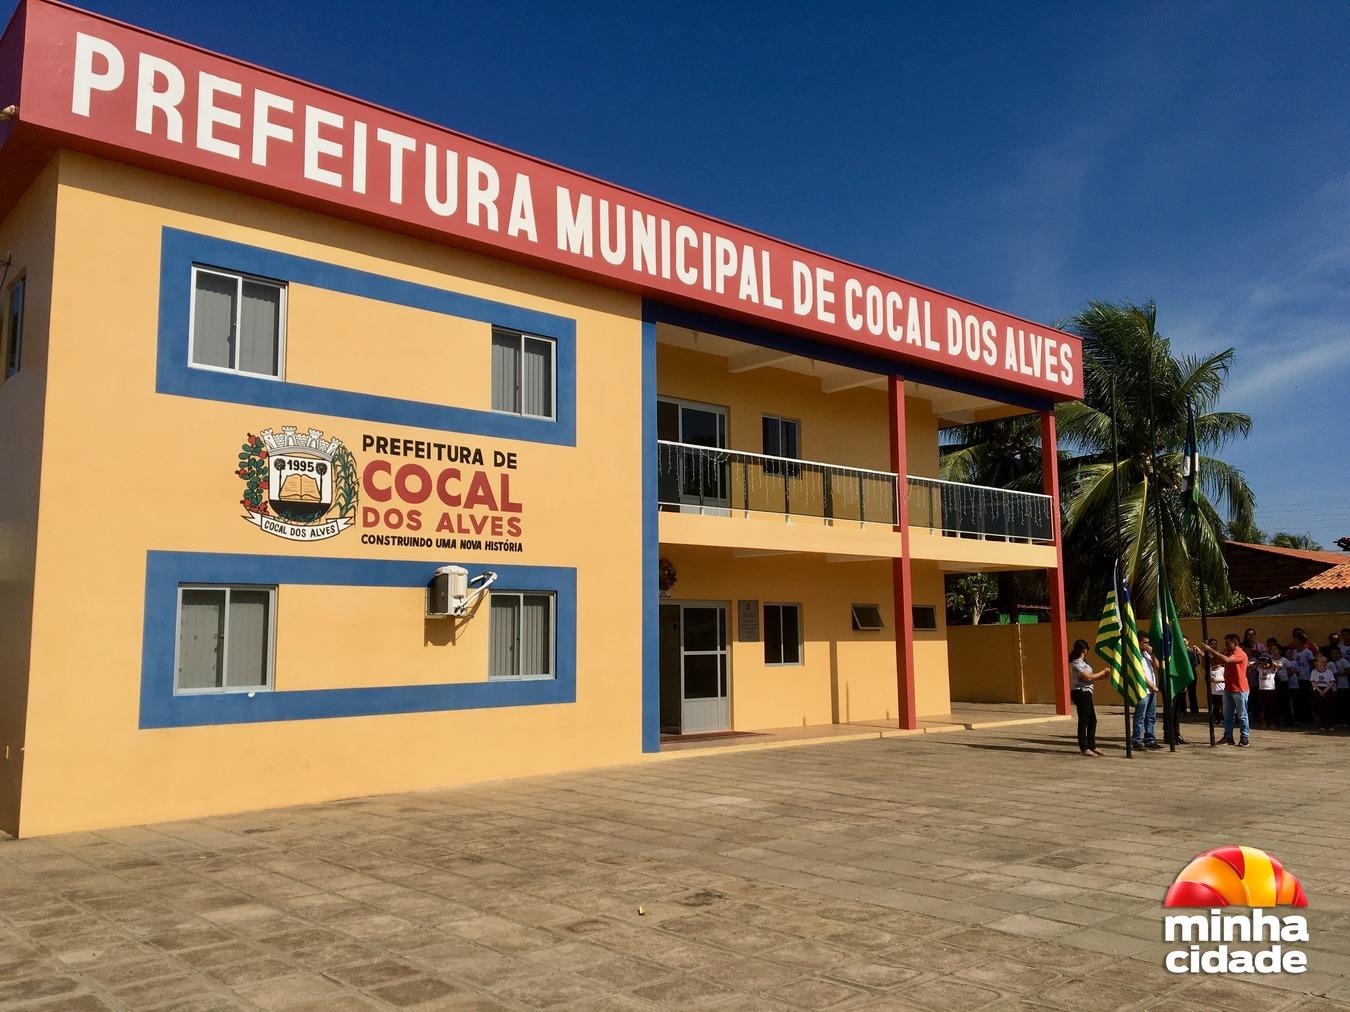 Sede da Prefeitura Municipal de Cocal dos Alves